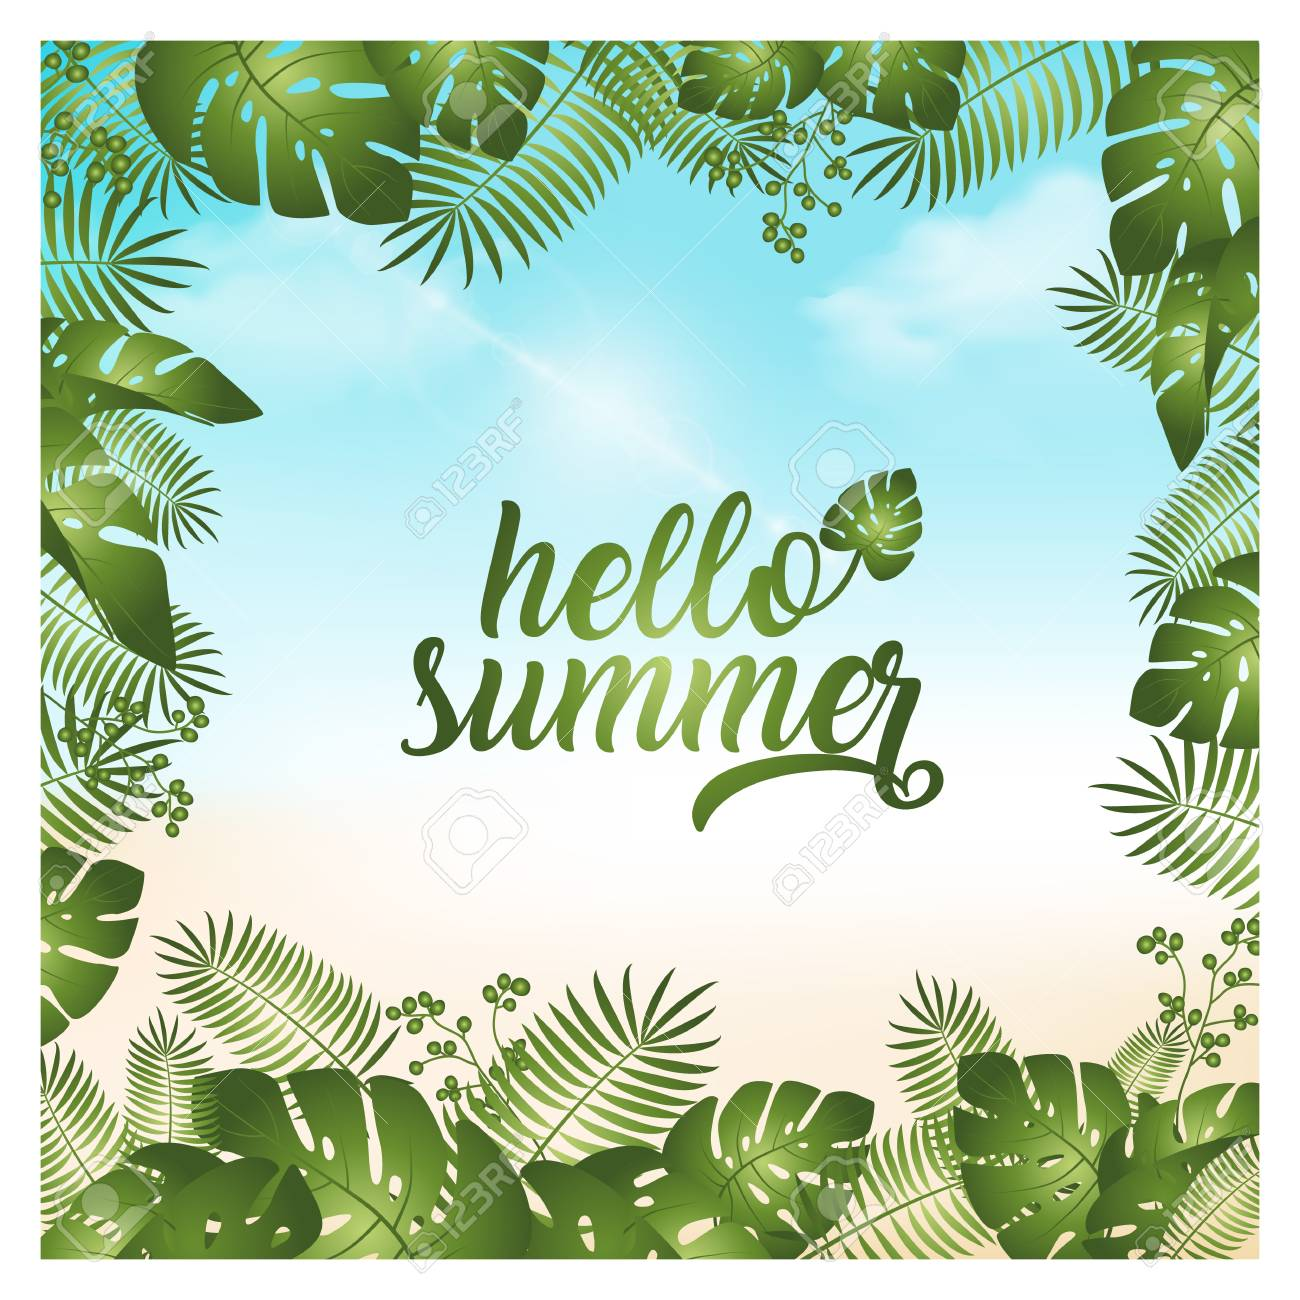 hello summer background vector illustration - 125453713